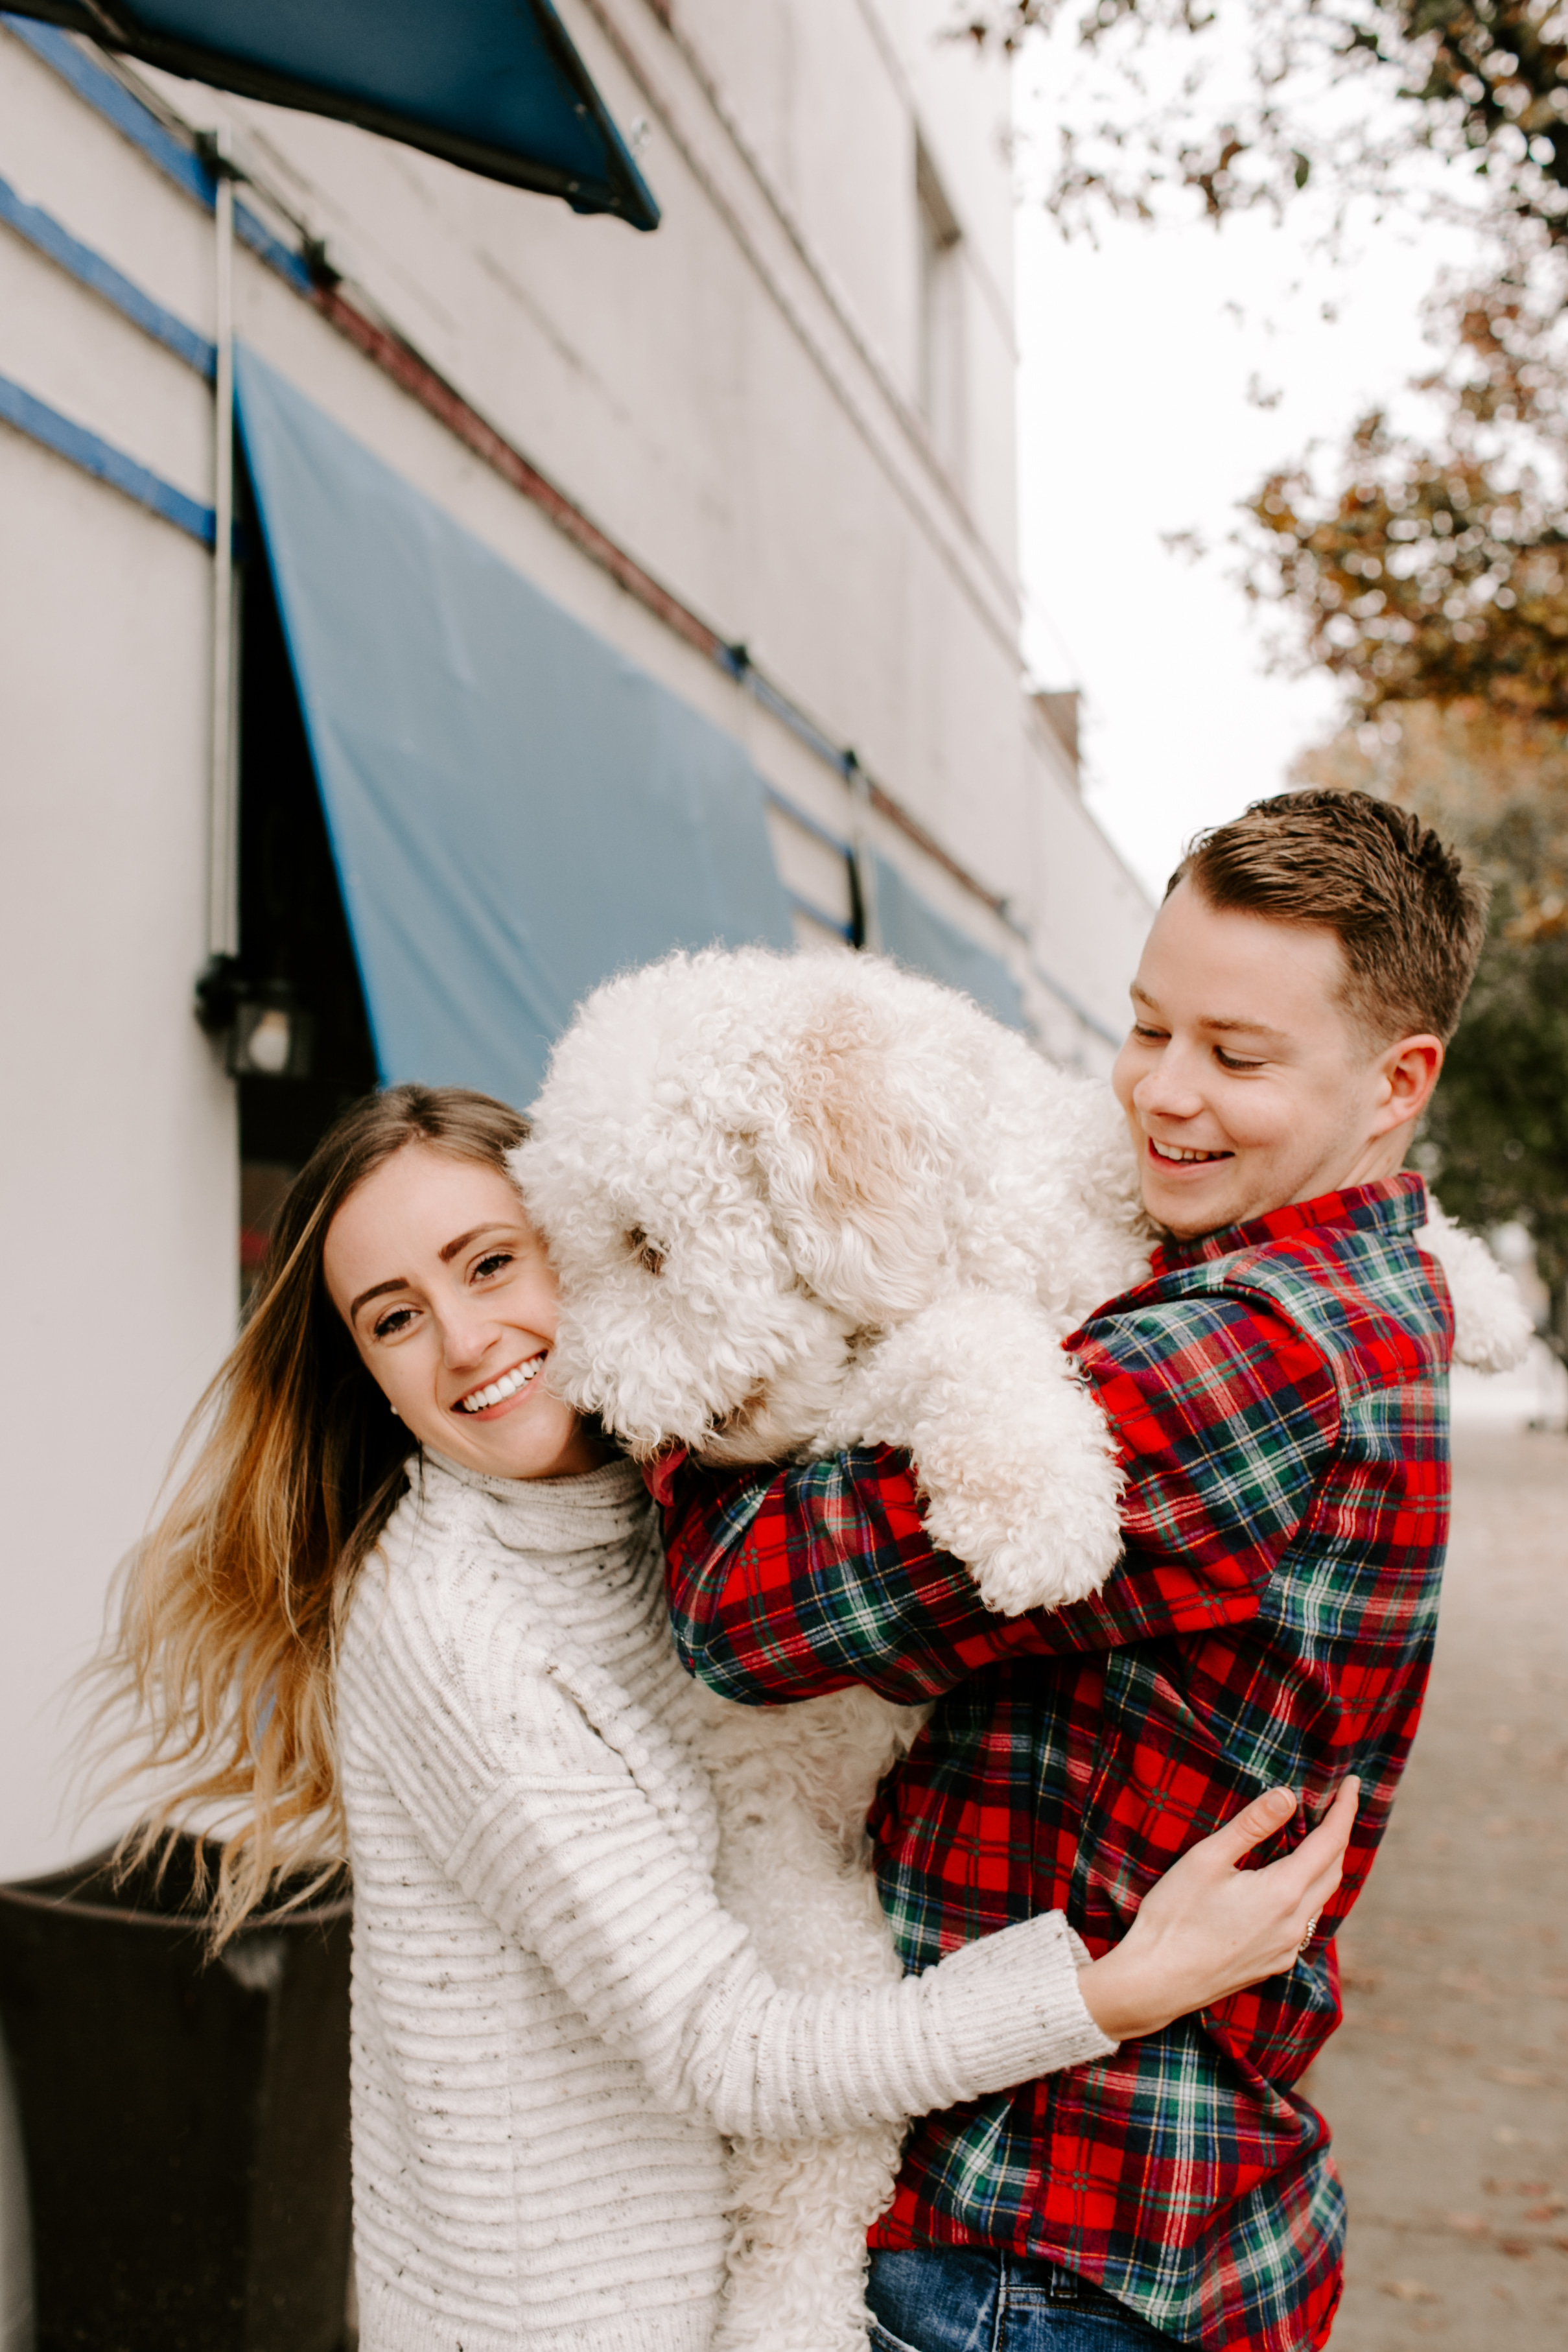 Hallie and Tyler Couple Photos downtown Broad Ripple Indiana Emily Elyse Wehner Photography LLC-48.jpg